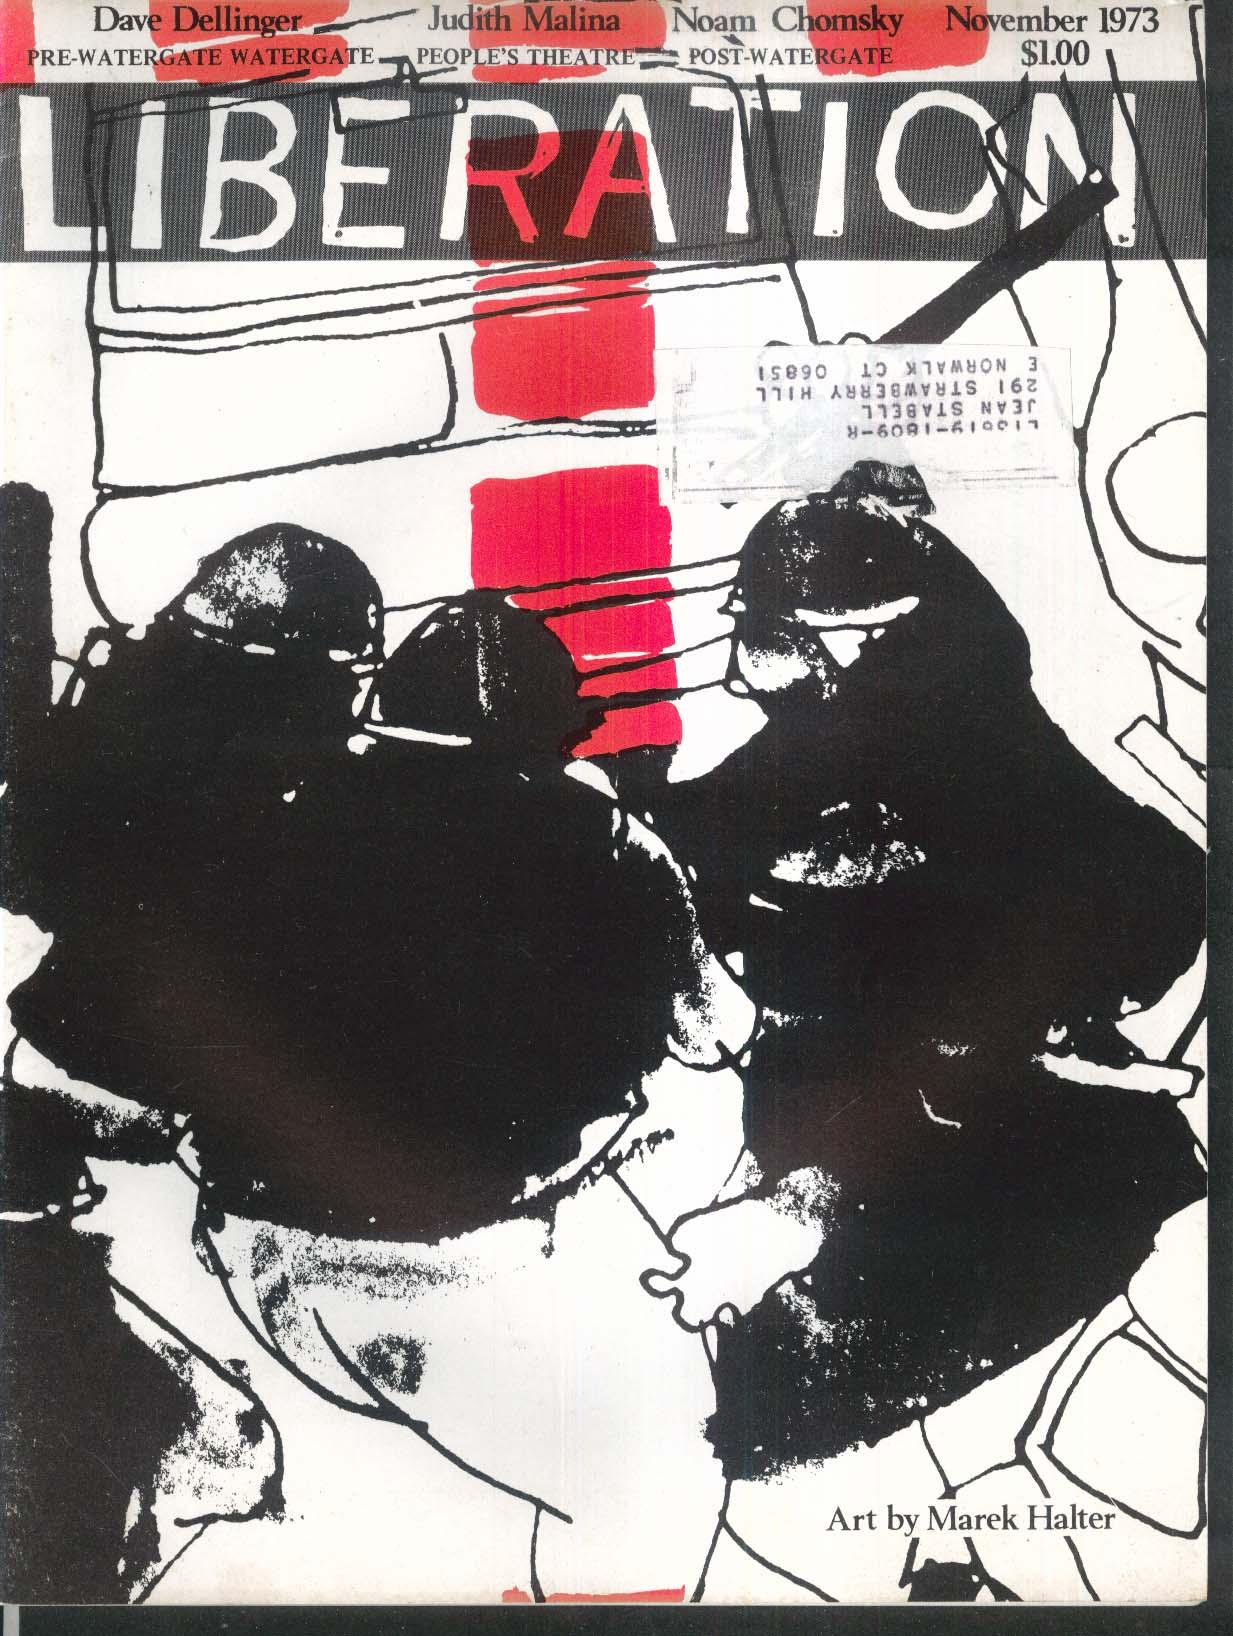 LIBERATION Watergate Dave Dellinger Judith Malina Noam Chomsky 11 1973